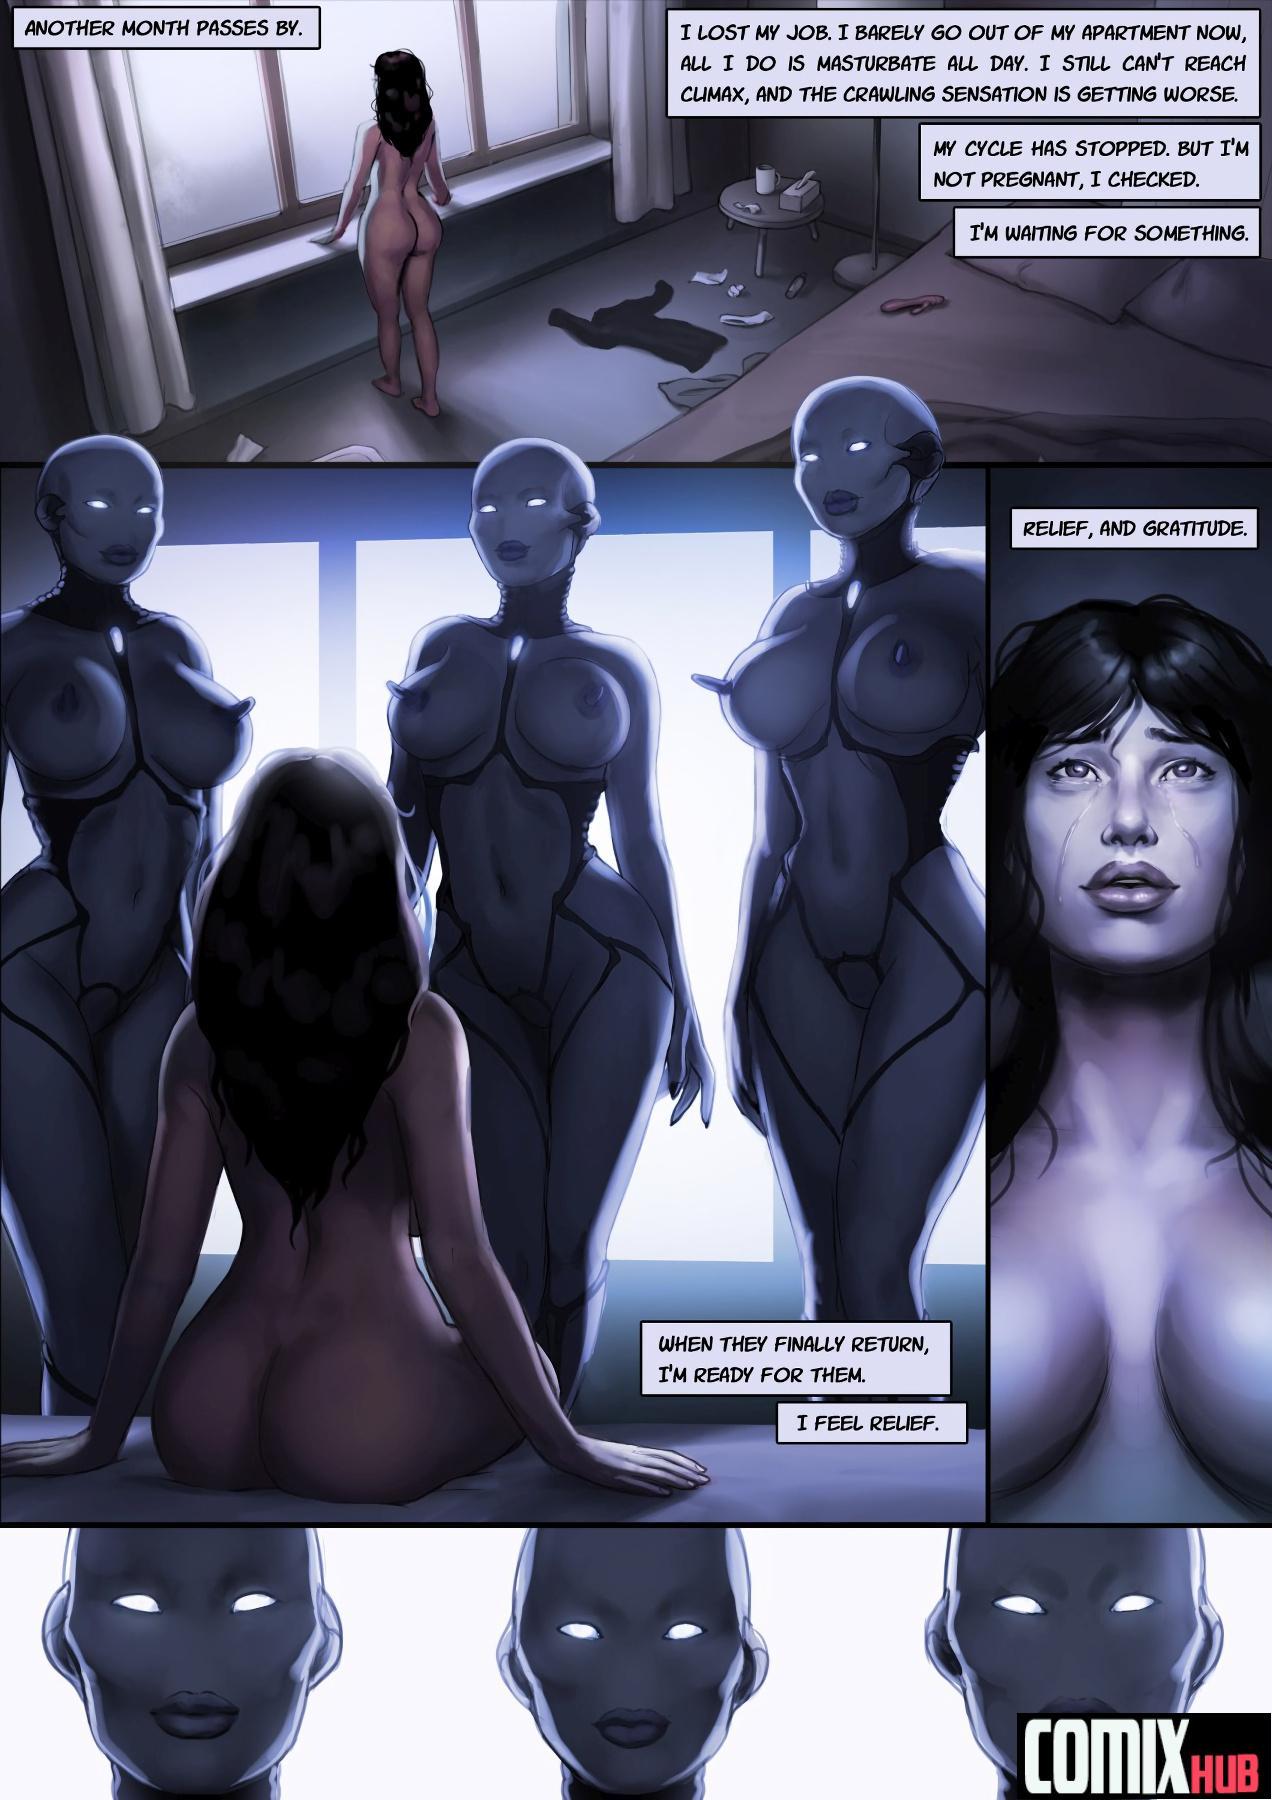 Xenomorphosis: Dark Dreams Oral sex, Aliens, Anal Sex, cunnilingus, Double Penetration, fingering, Group Sex, Masturbation, Rape, Straight